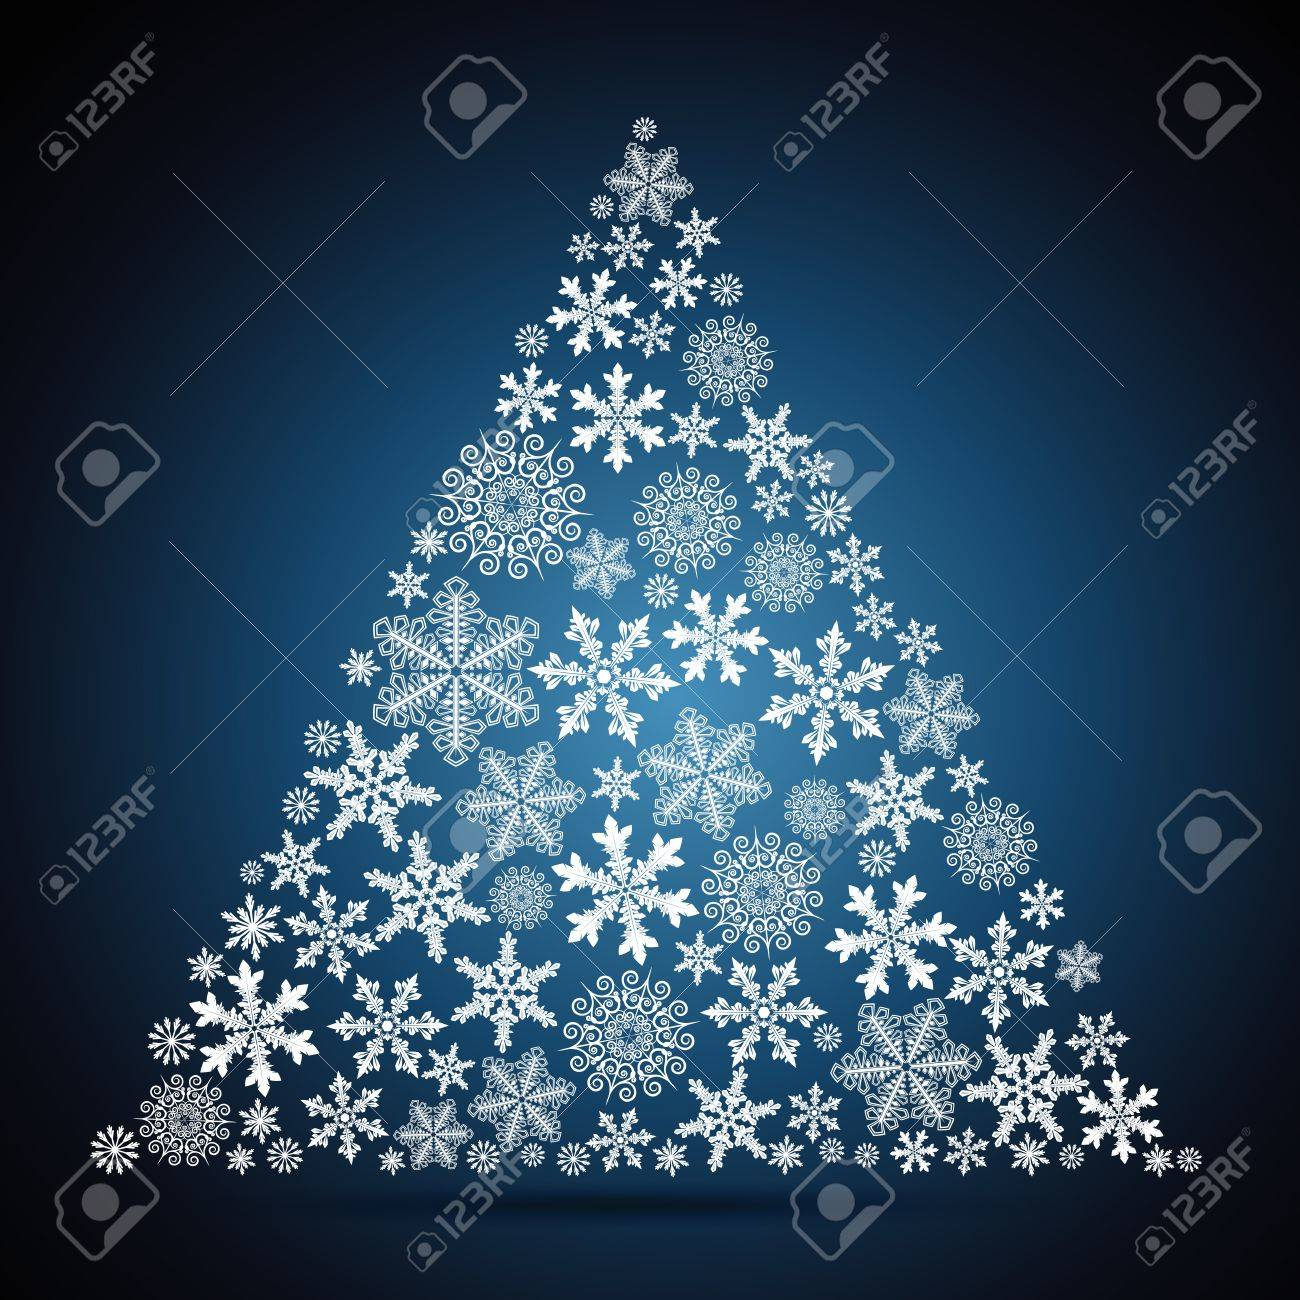 Christmas tree, snowflake design background. Stock Vector - 15378093